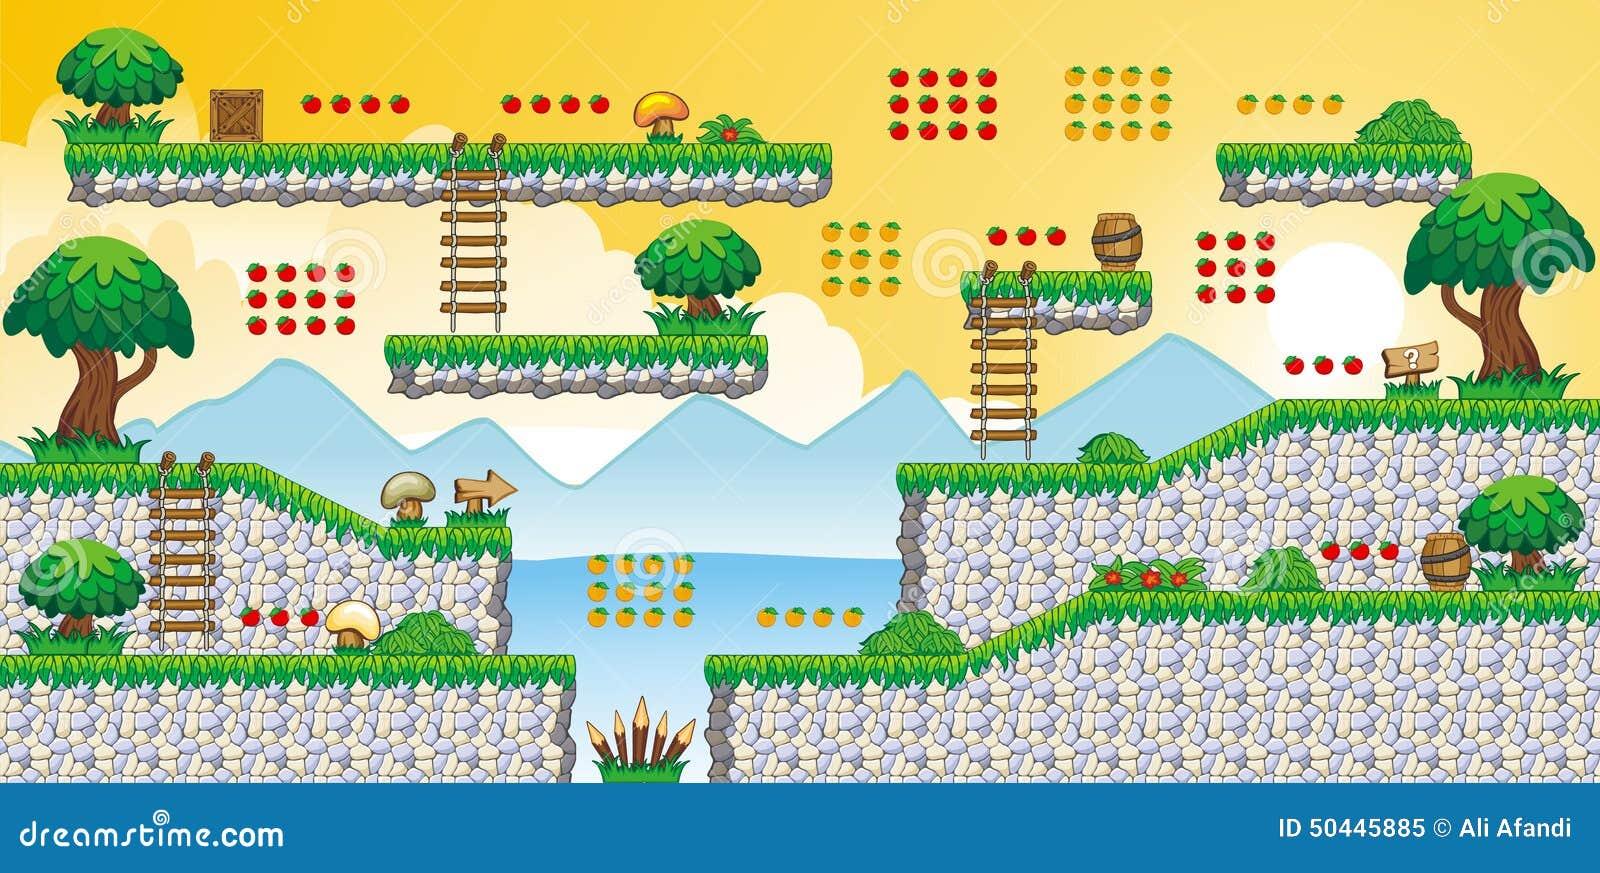 2D Tileset Platform Game 60 Stock Vector - Illustration of